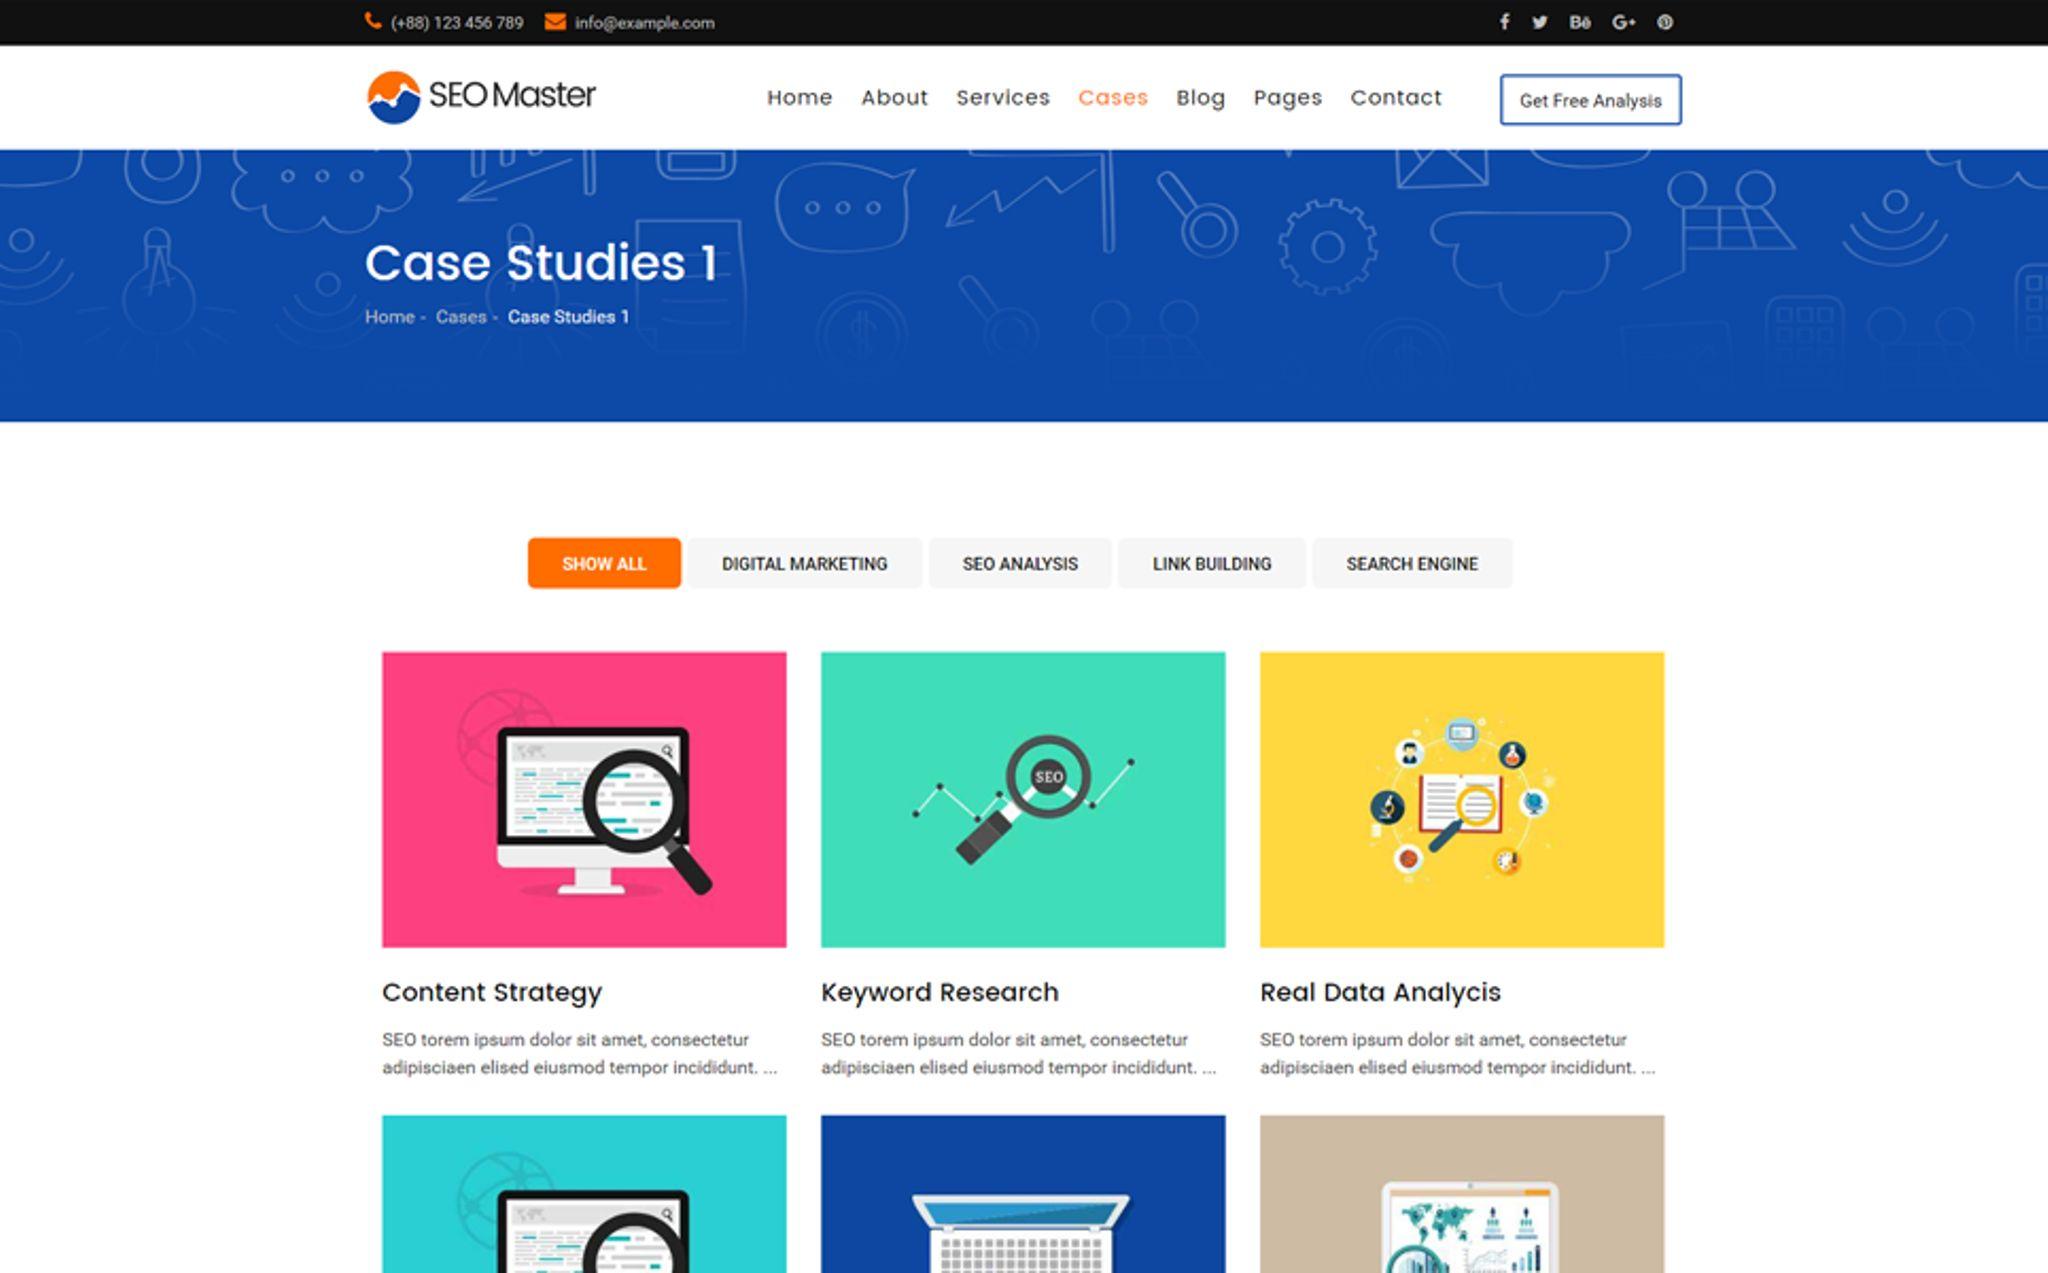 SEO Master – SEO & Digital Marketing Agency Website Template #67270